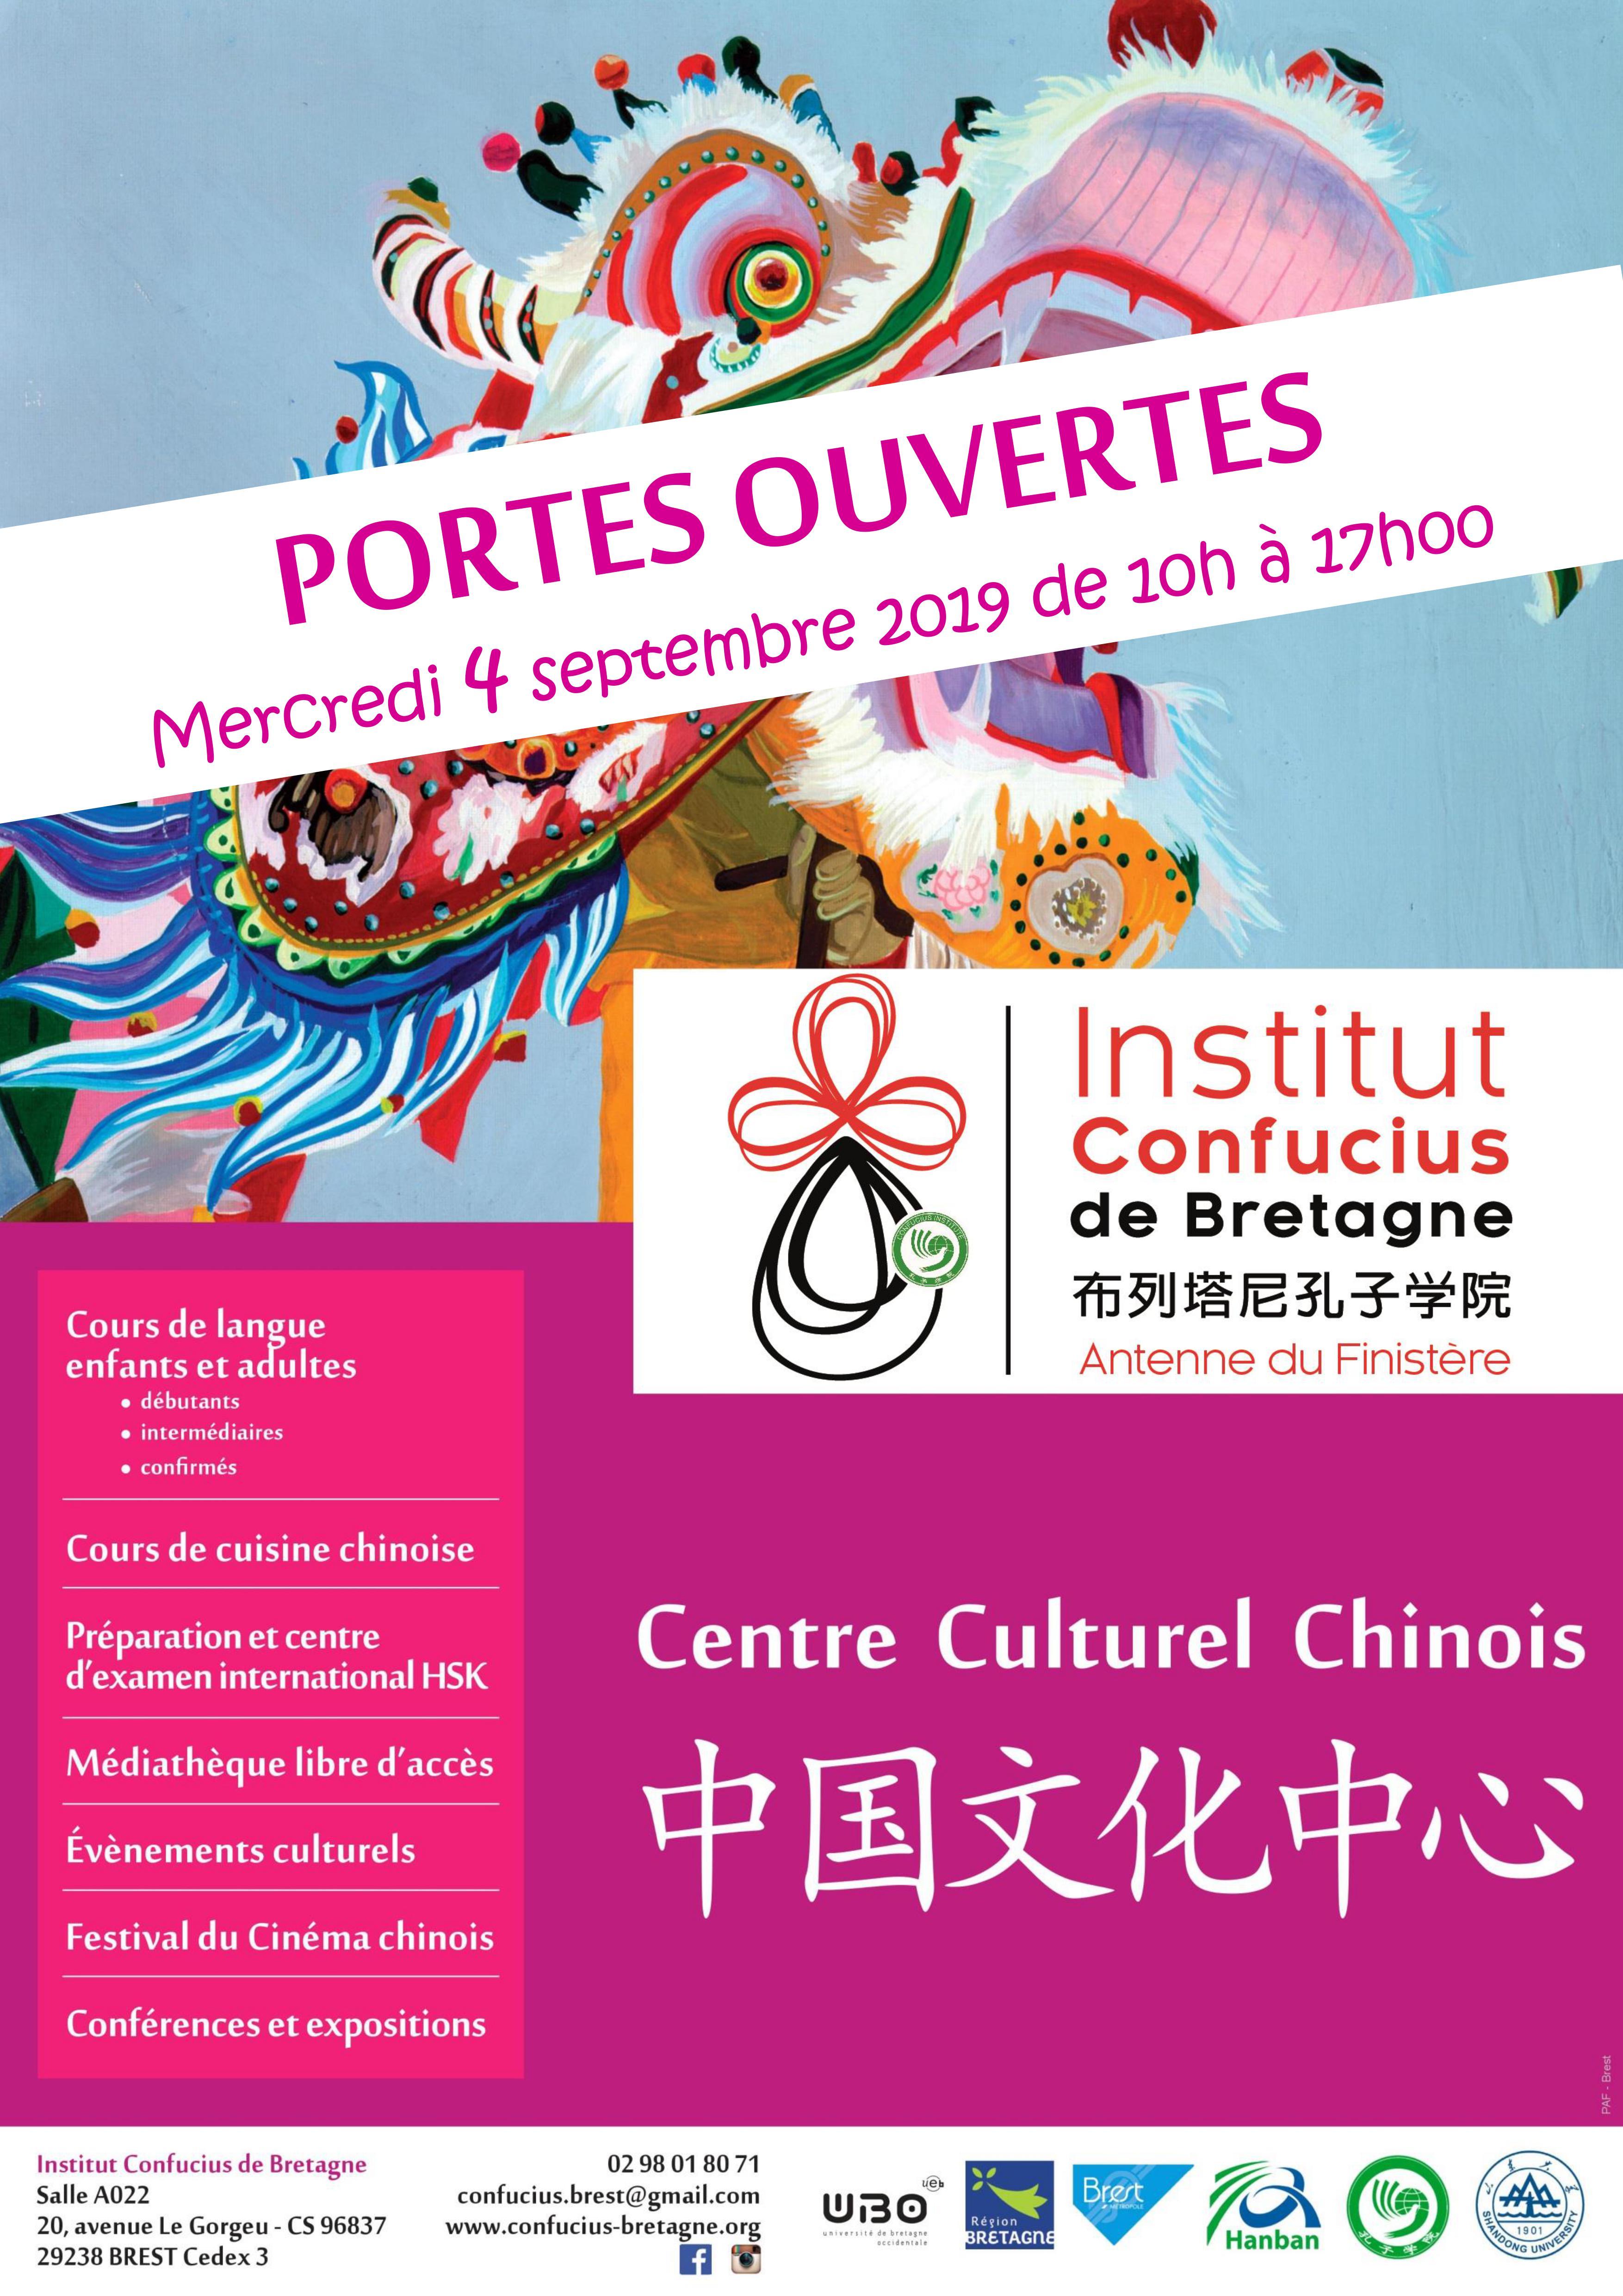 Portes Ouvertes Institut Confucius De Bretagne Antenne Du